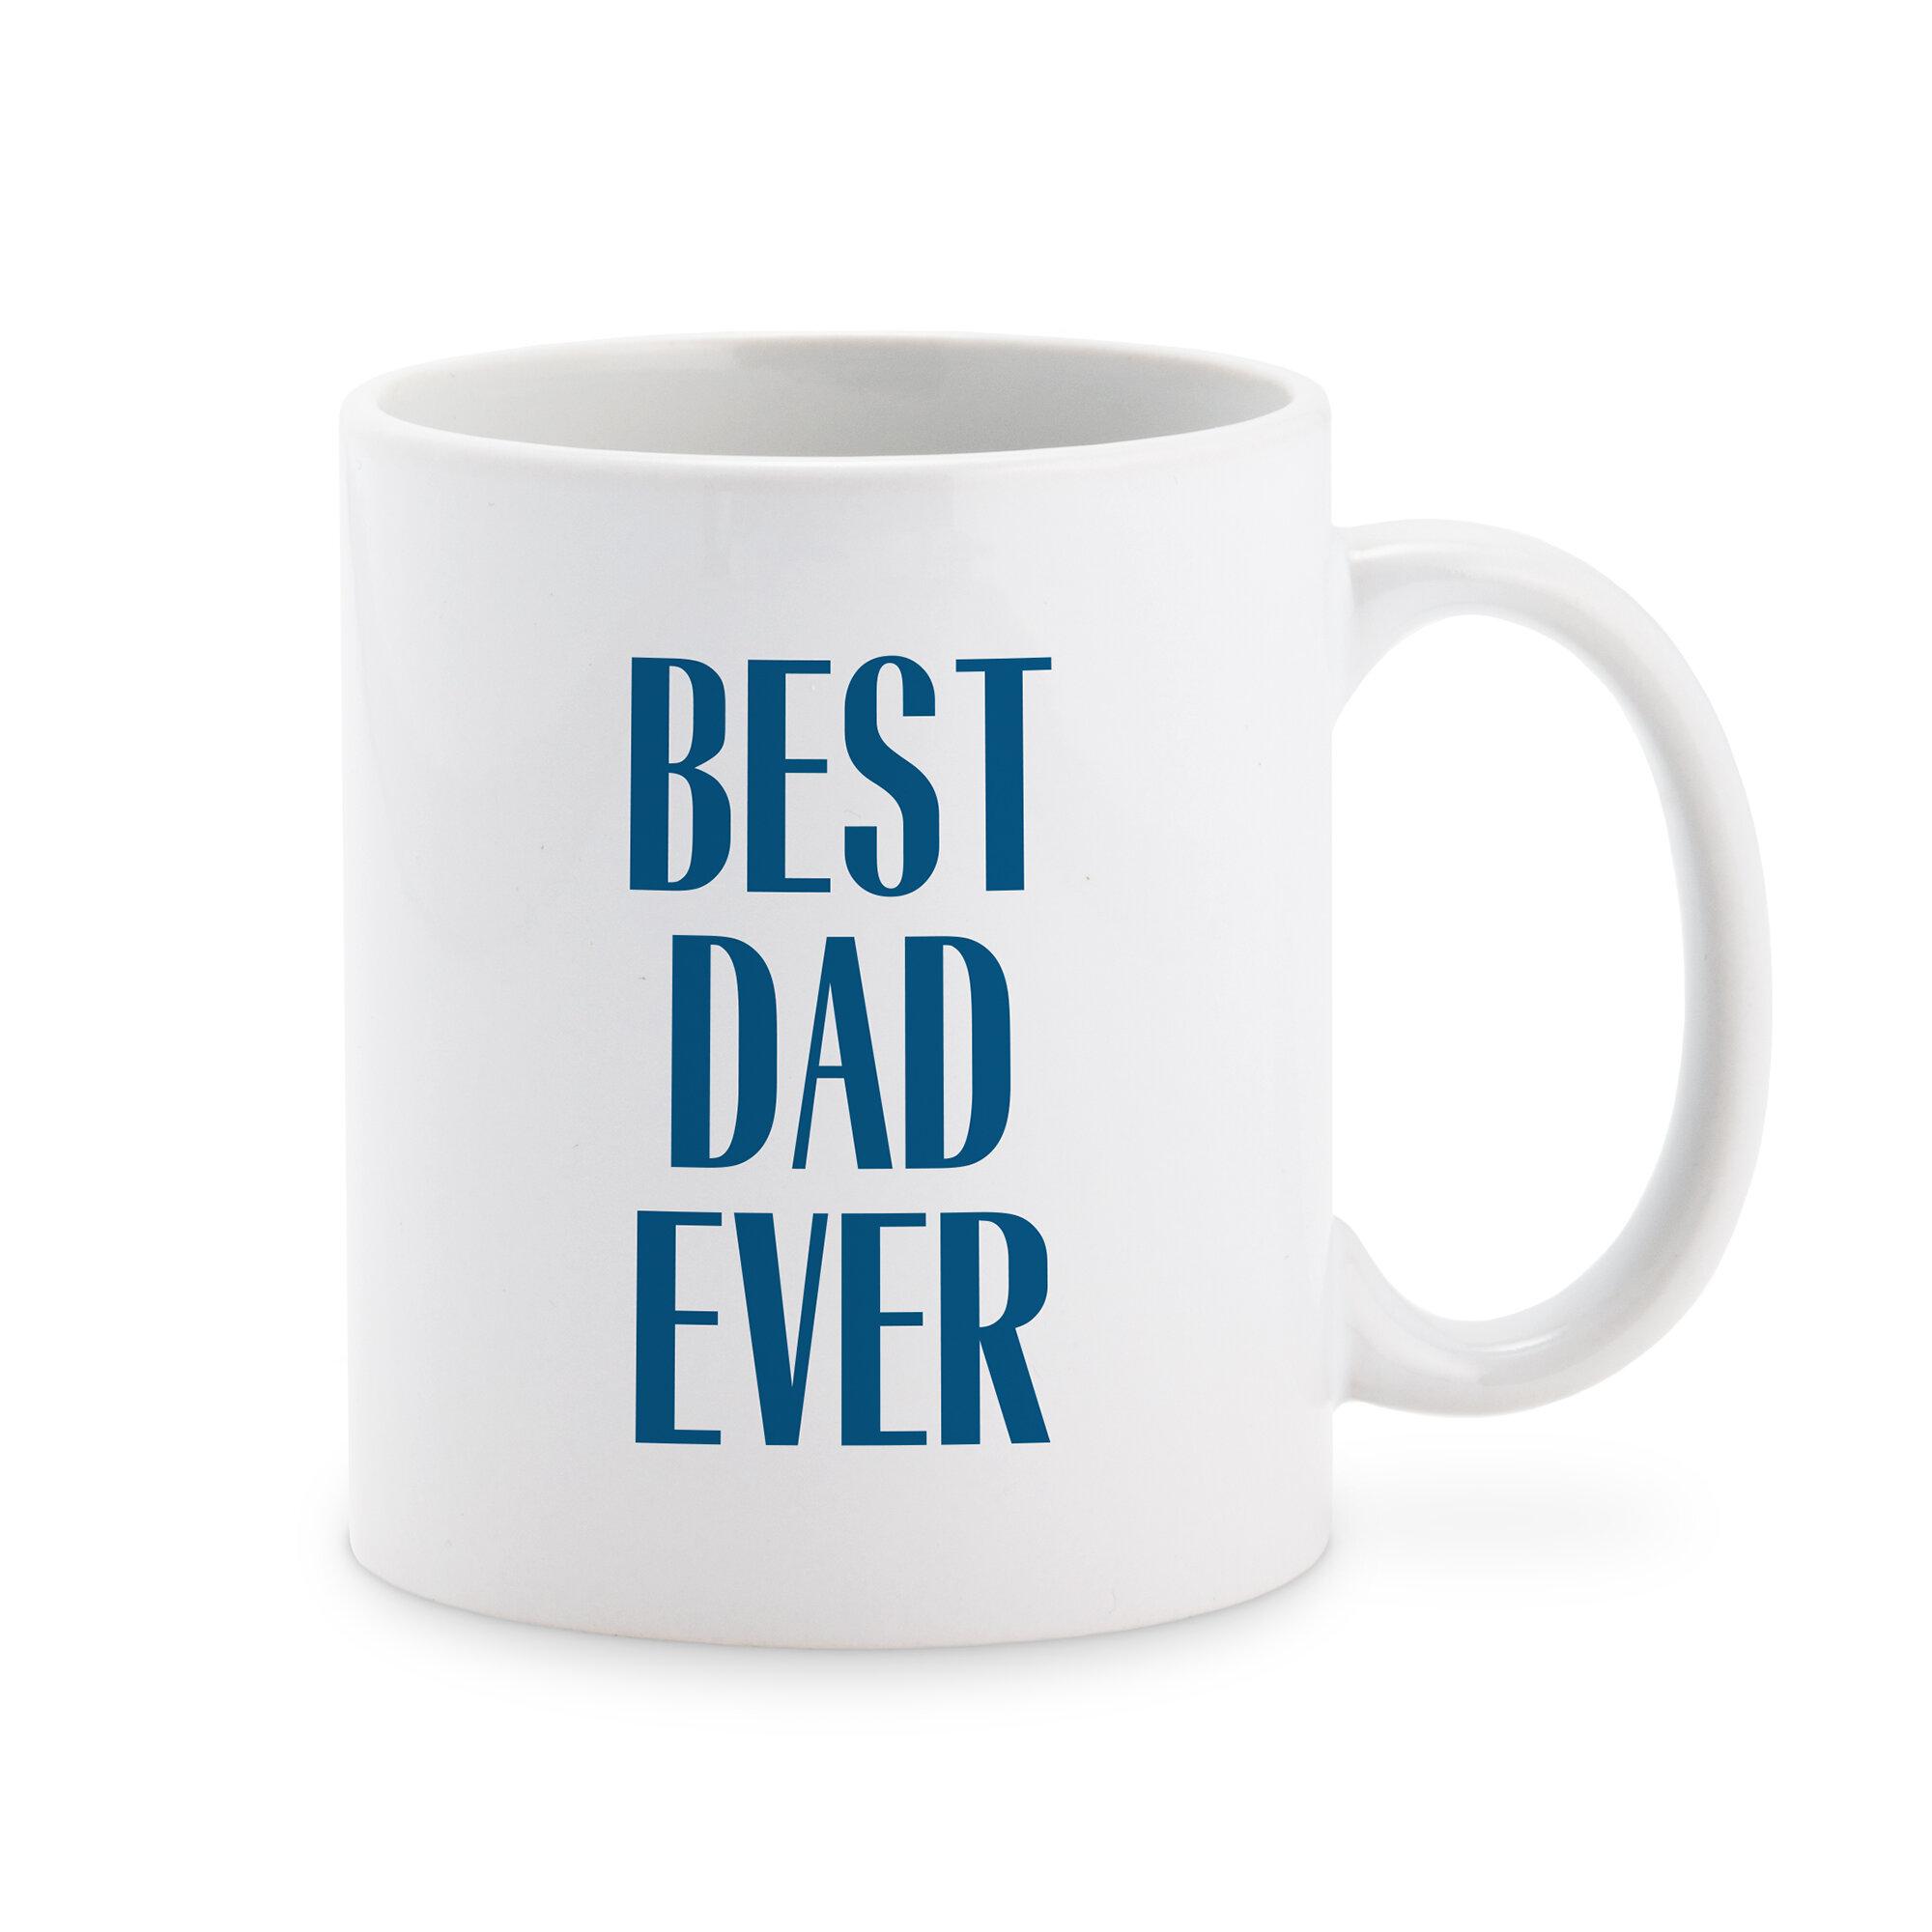 Ellenton Coffee Table With Storage: Winston Porter Ellenton Best Dad Ever Personalized Coffee